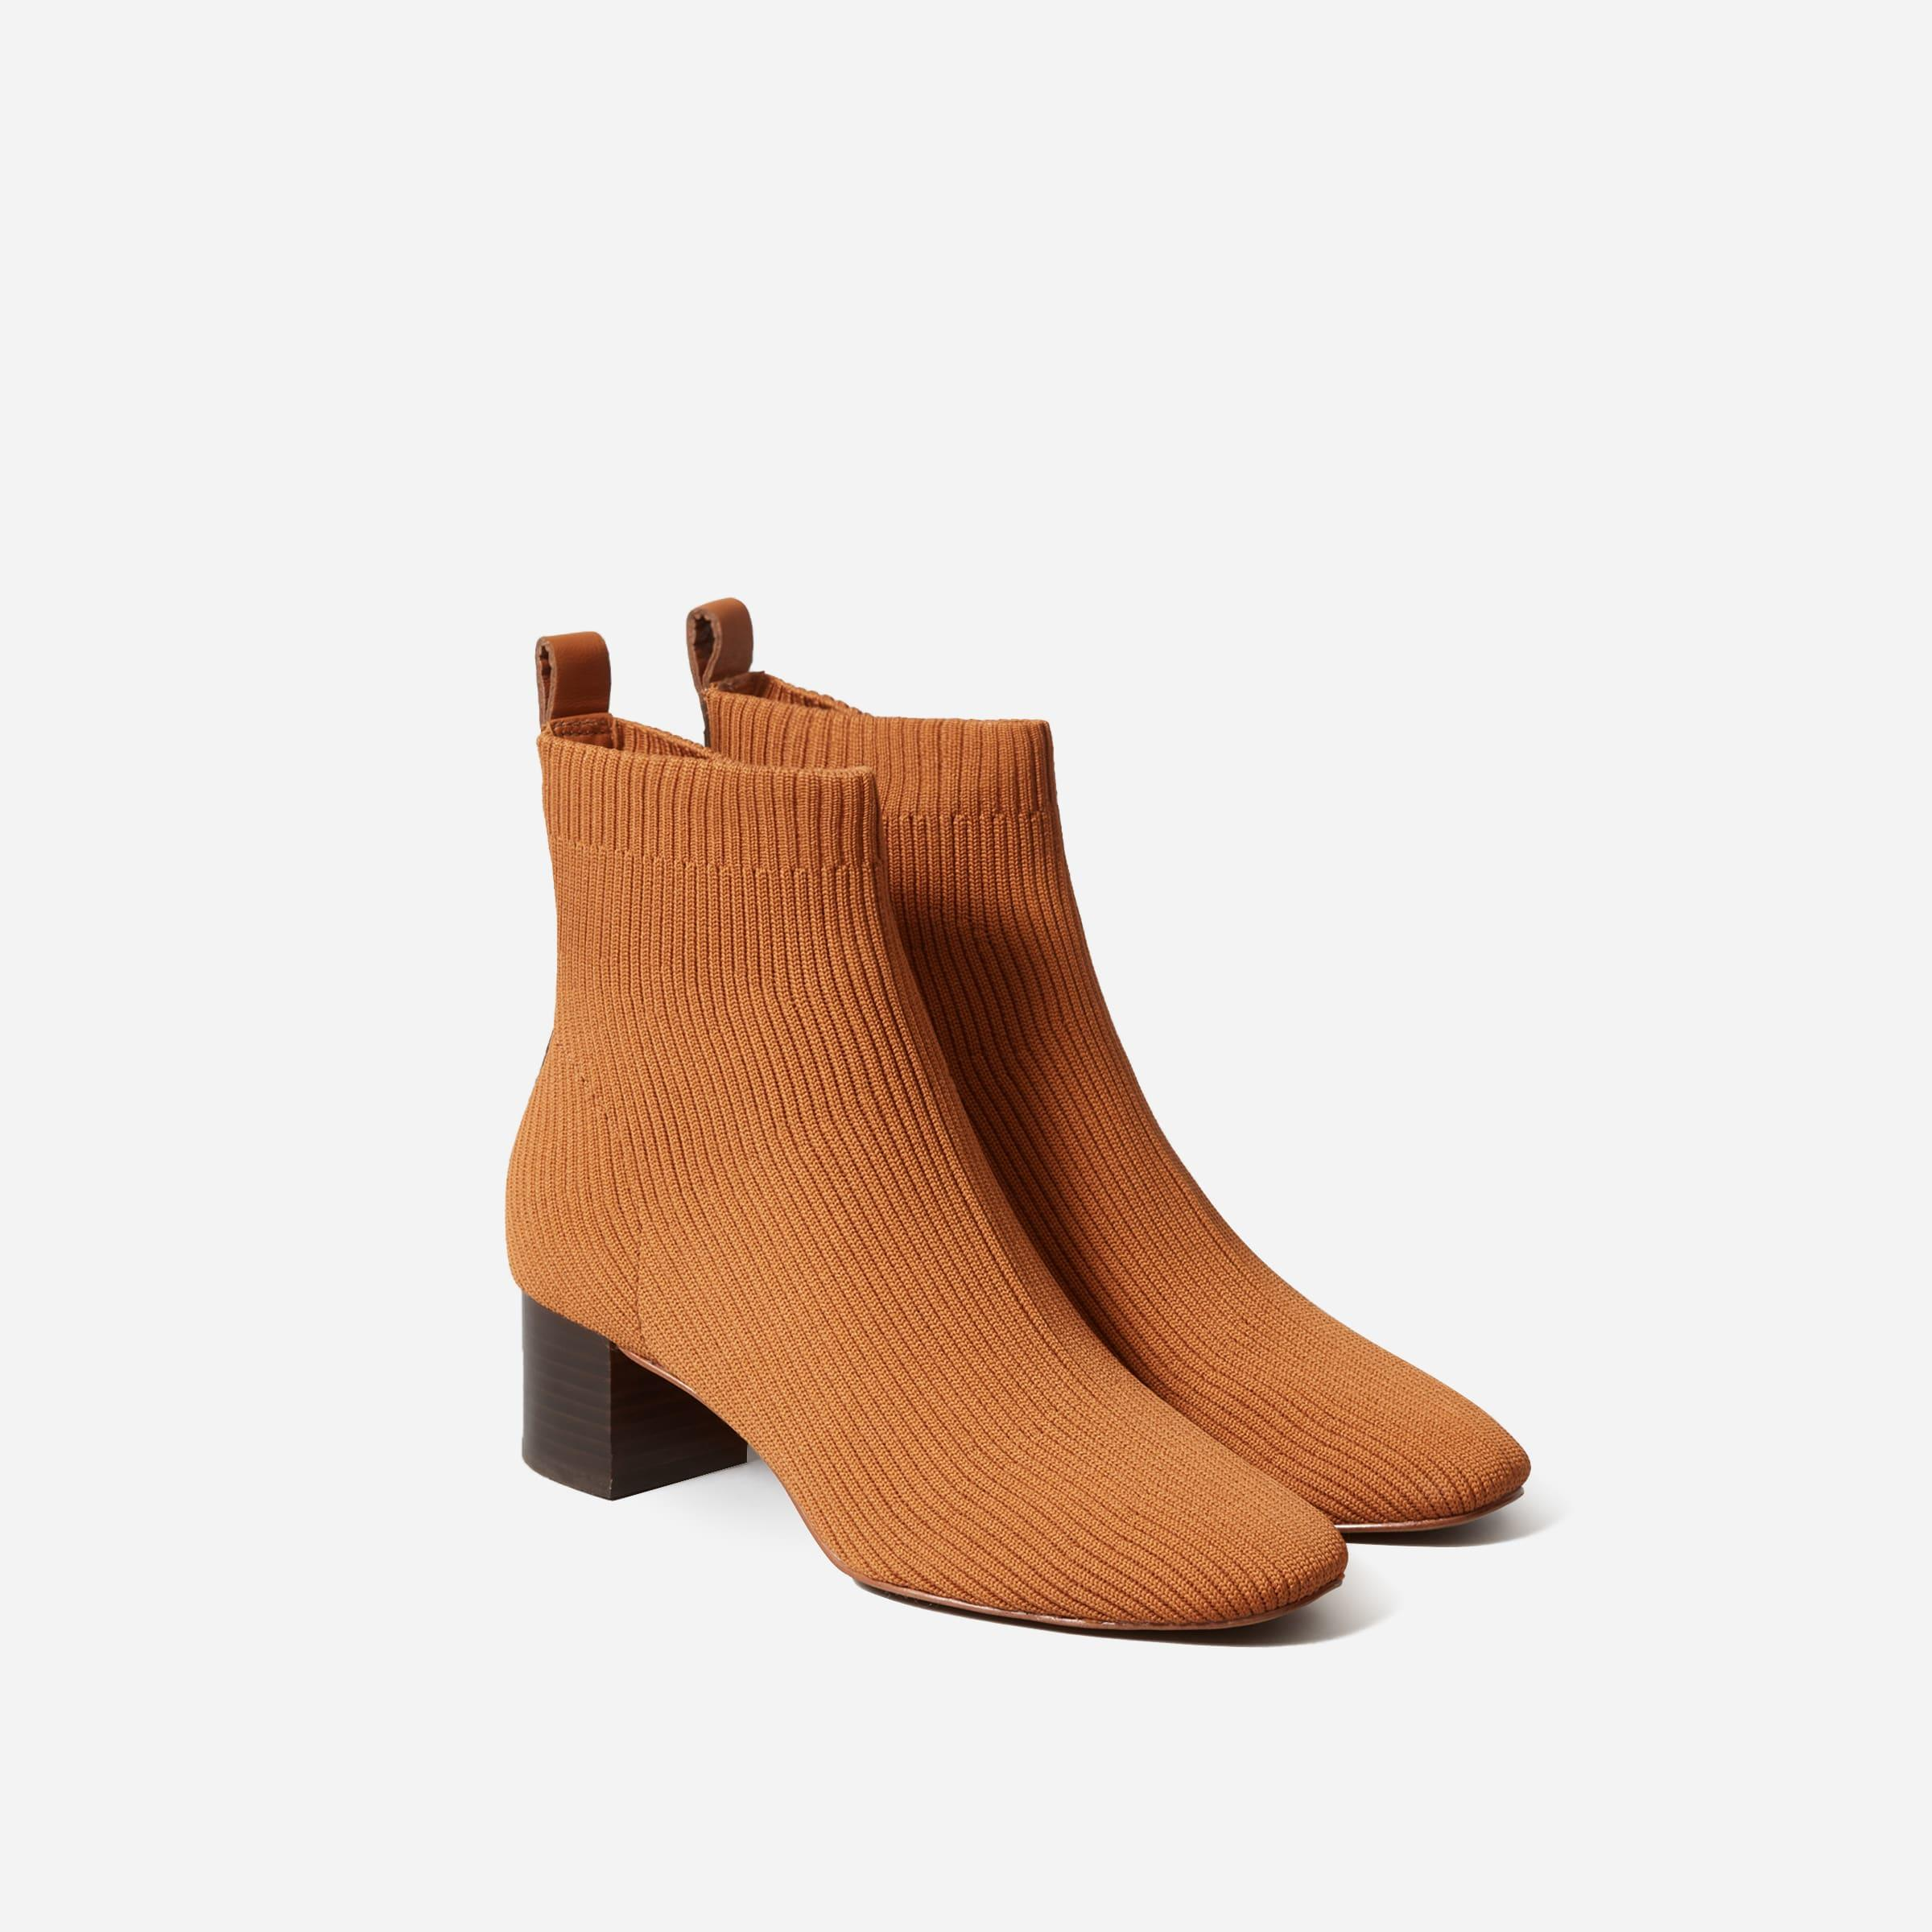 Everlane Glove boot